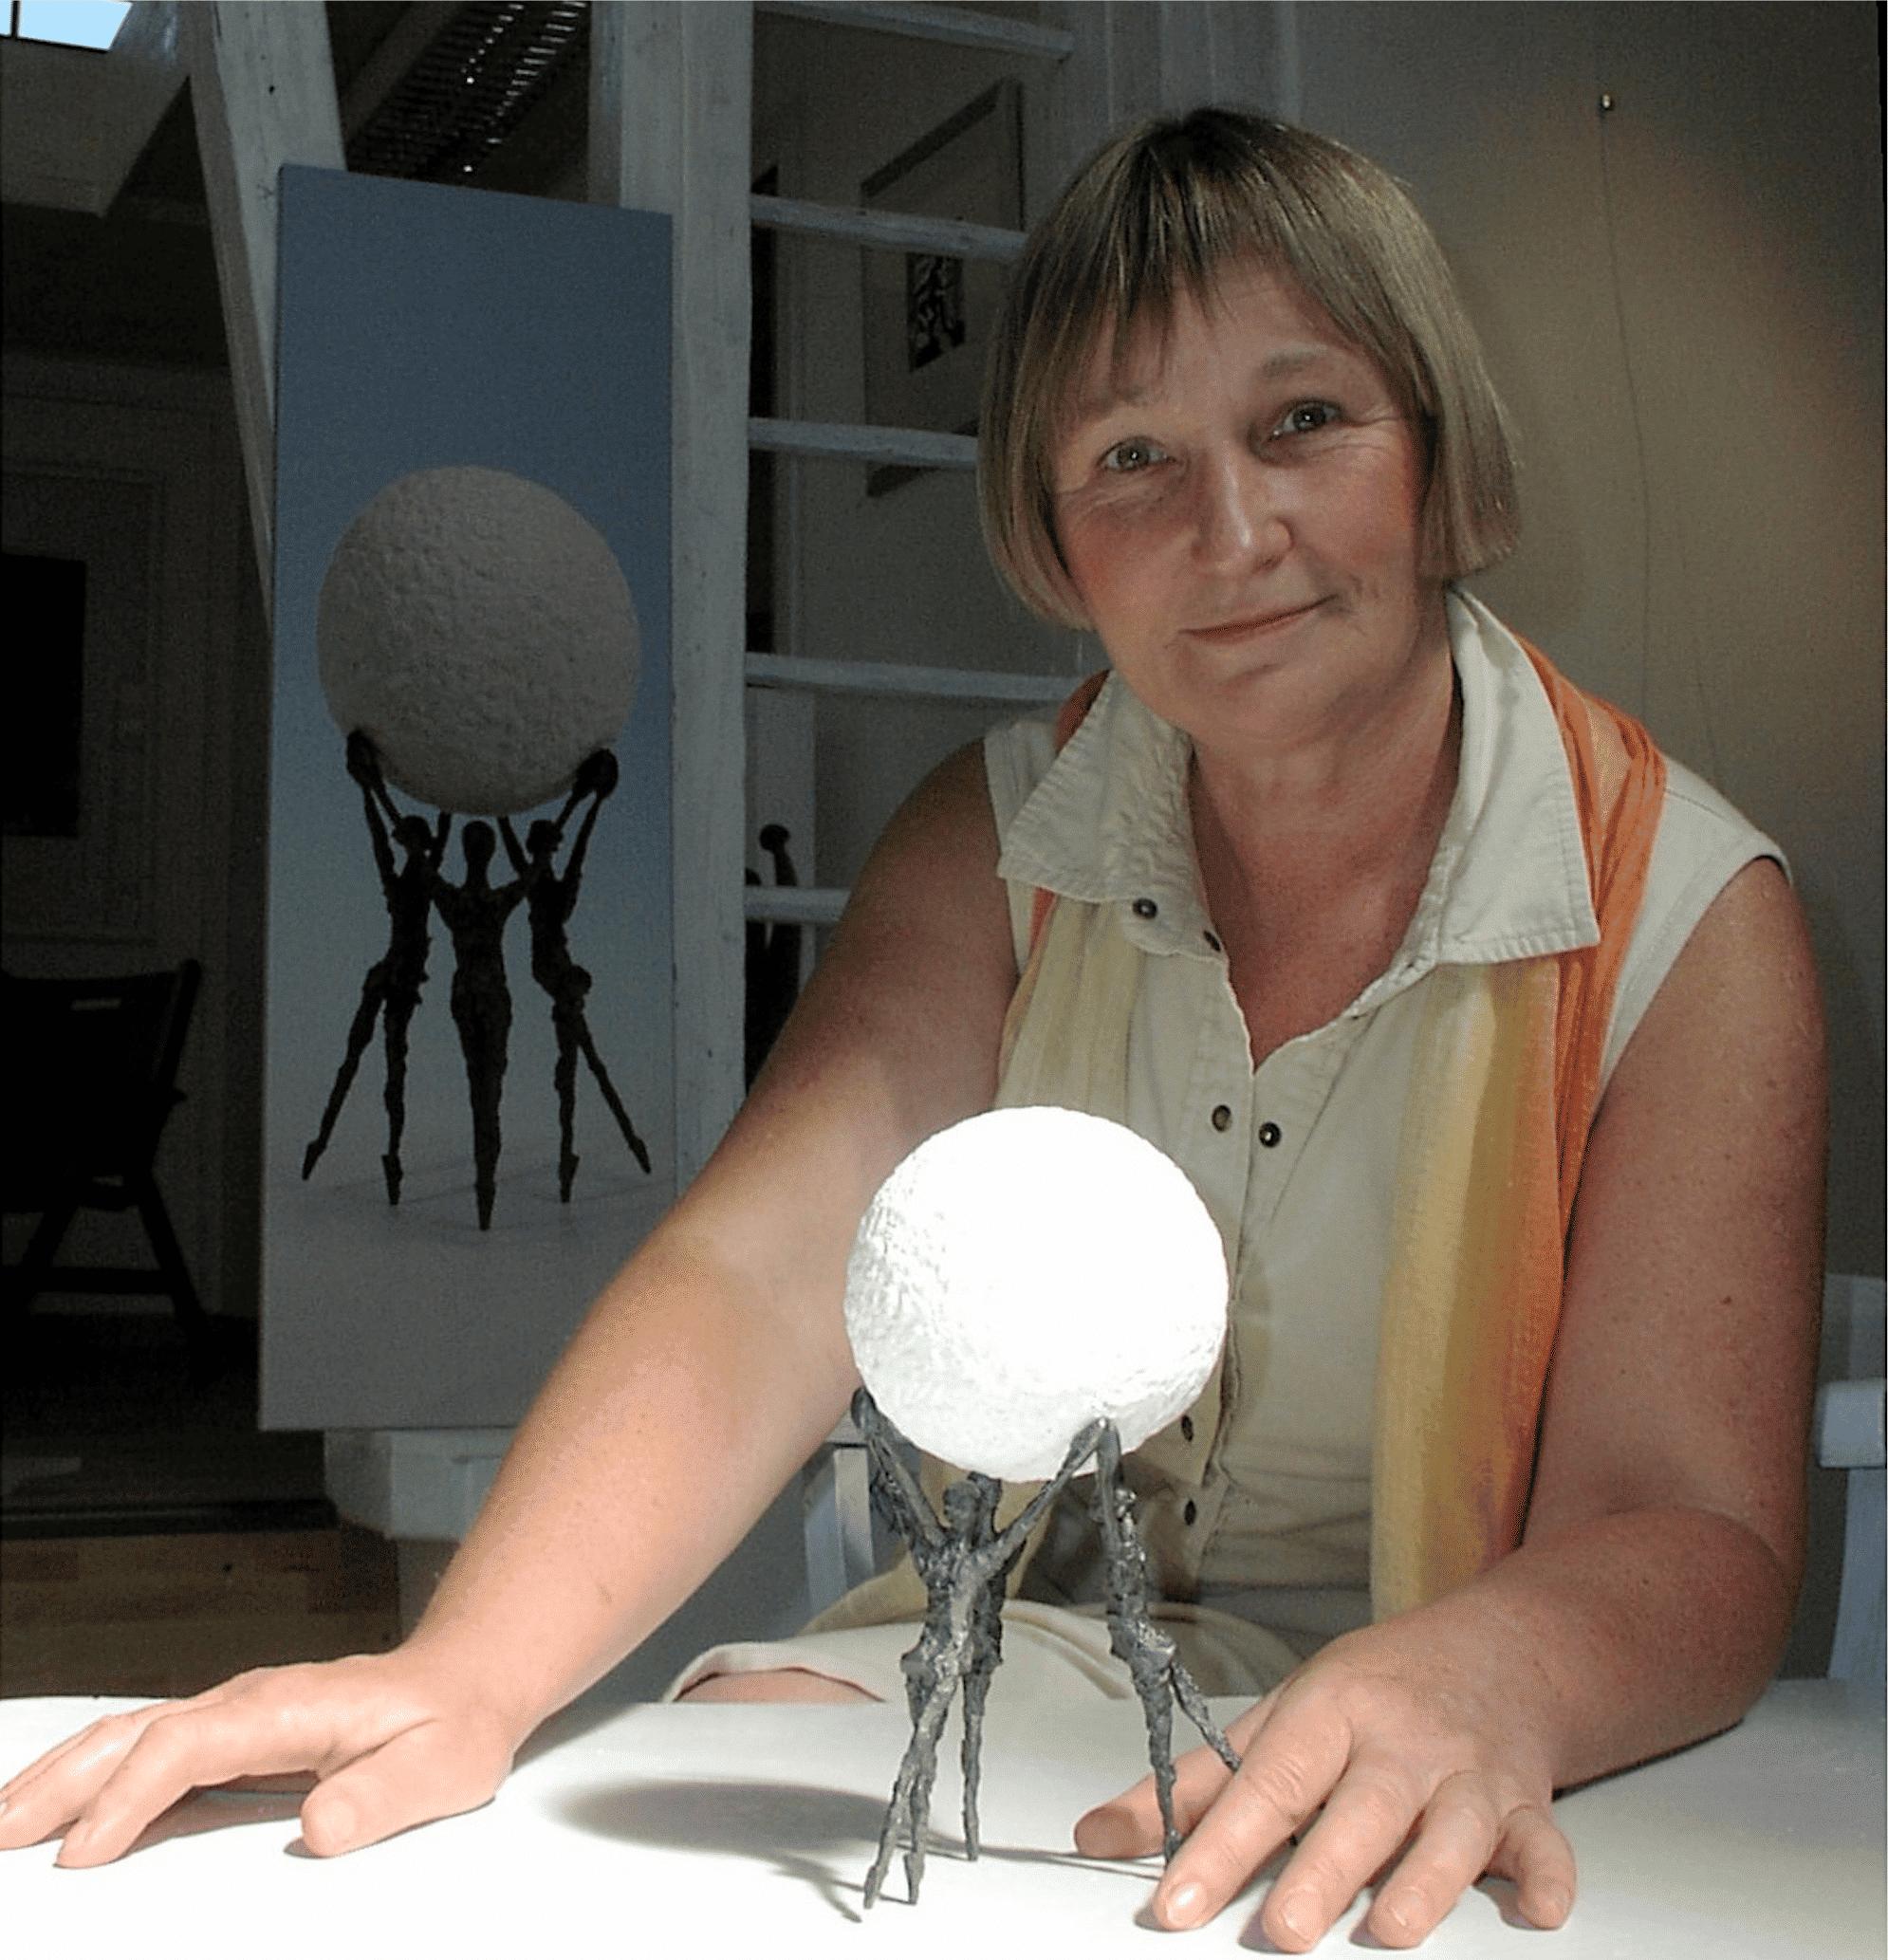 Om kunstneren Louise Kött-Gärtner